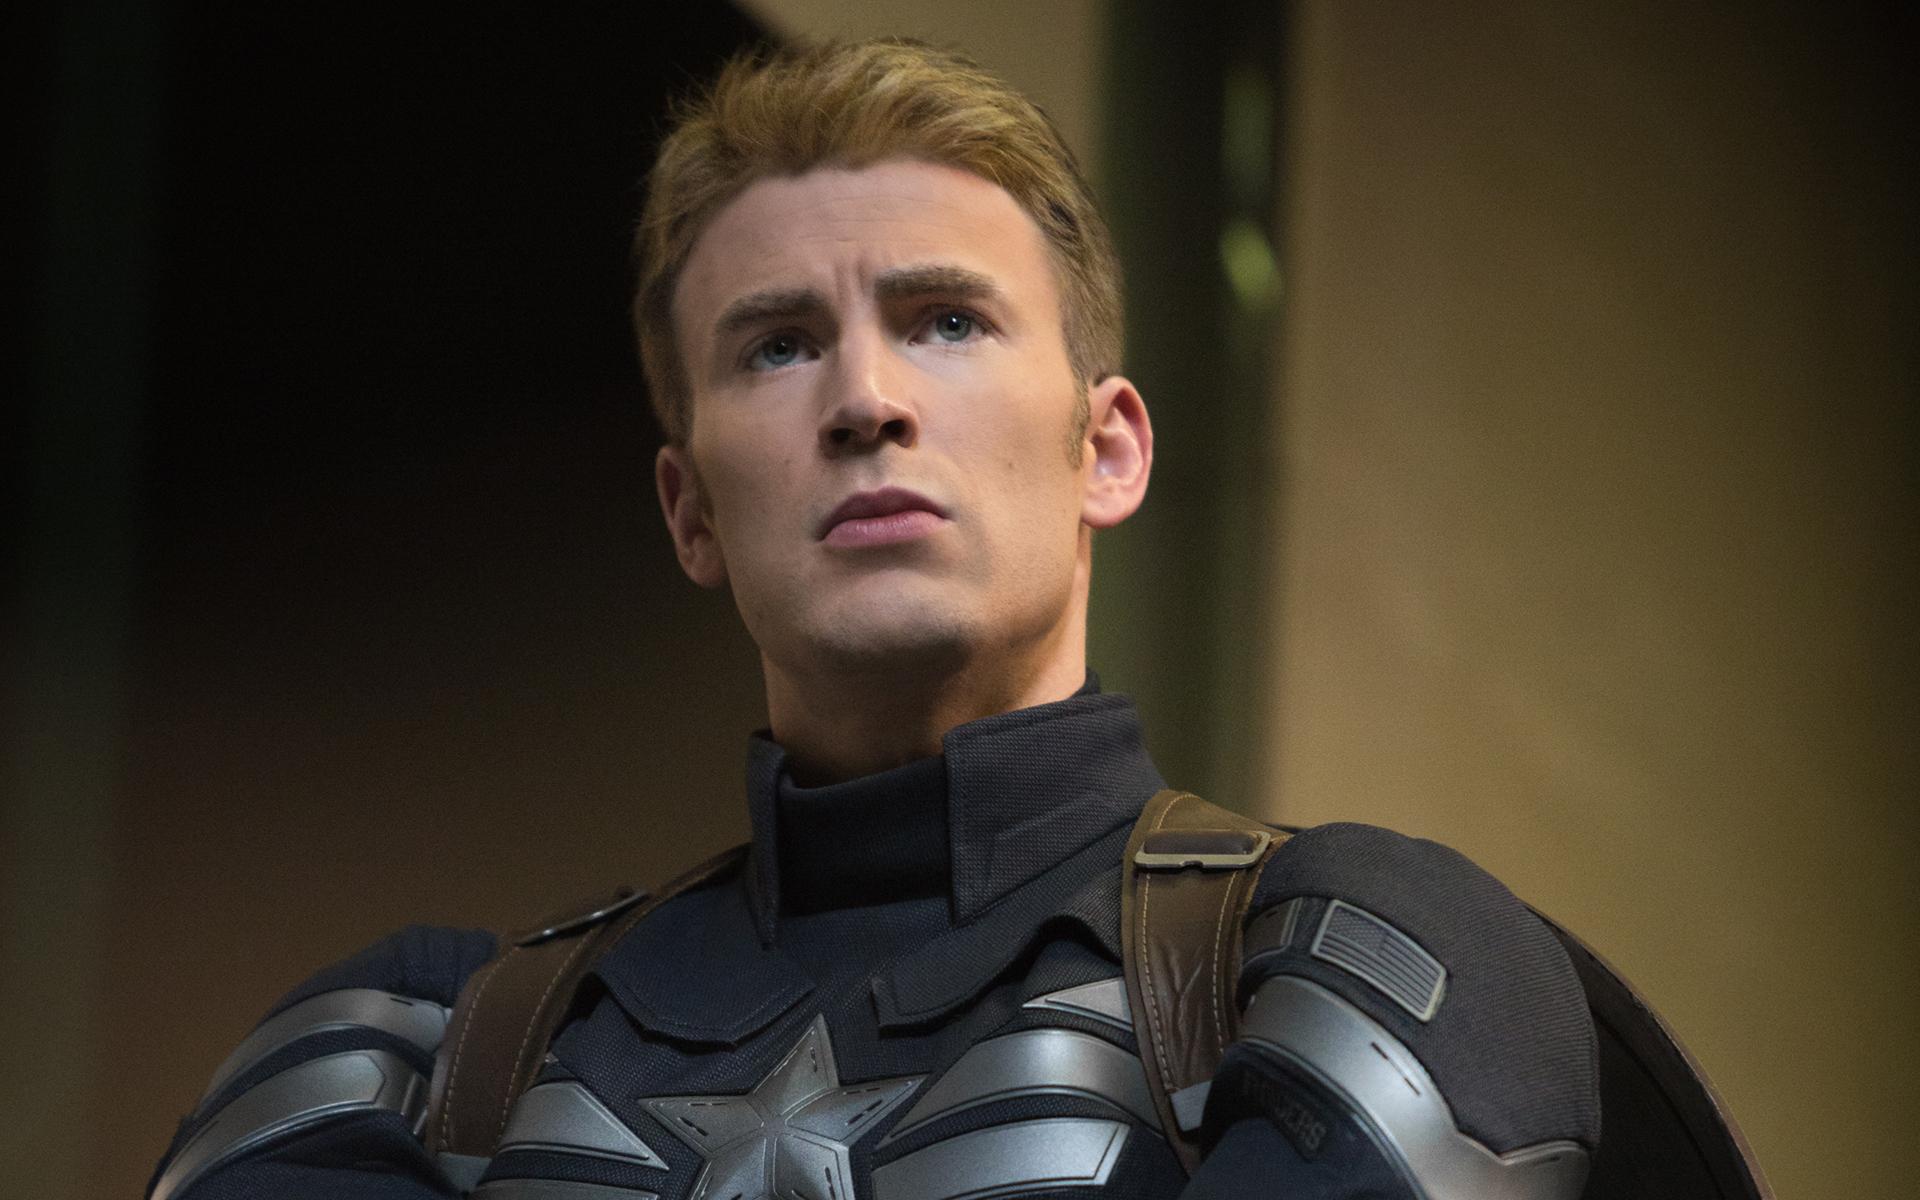 Download Chris Evans Captain America Wallpaper Gallery 1920x1200